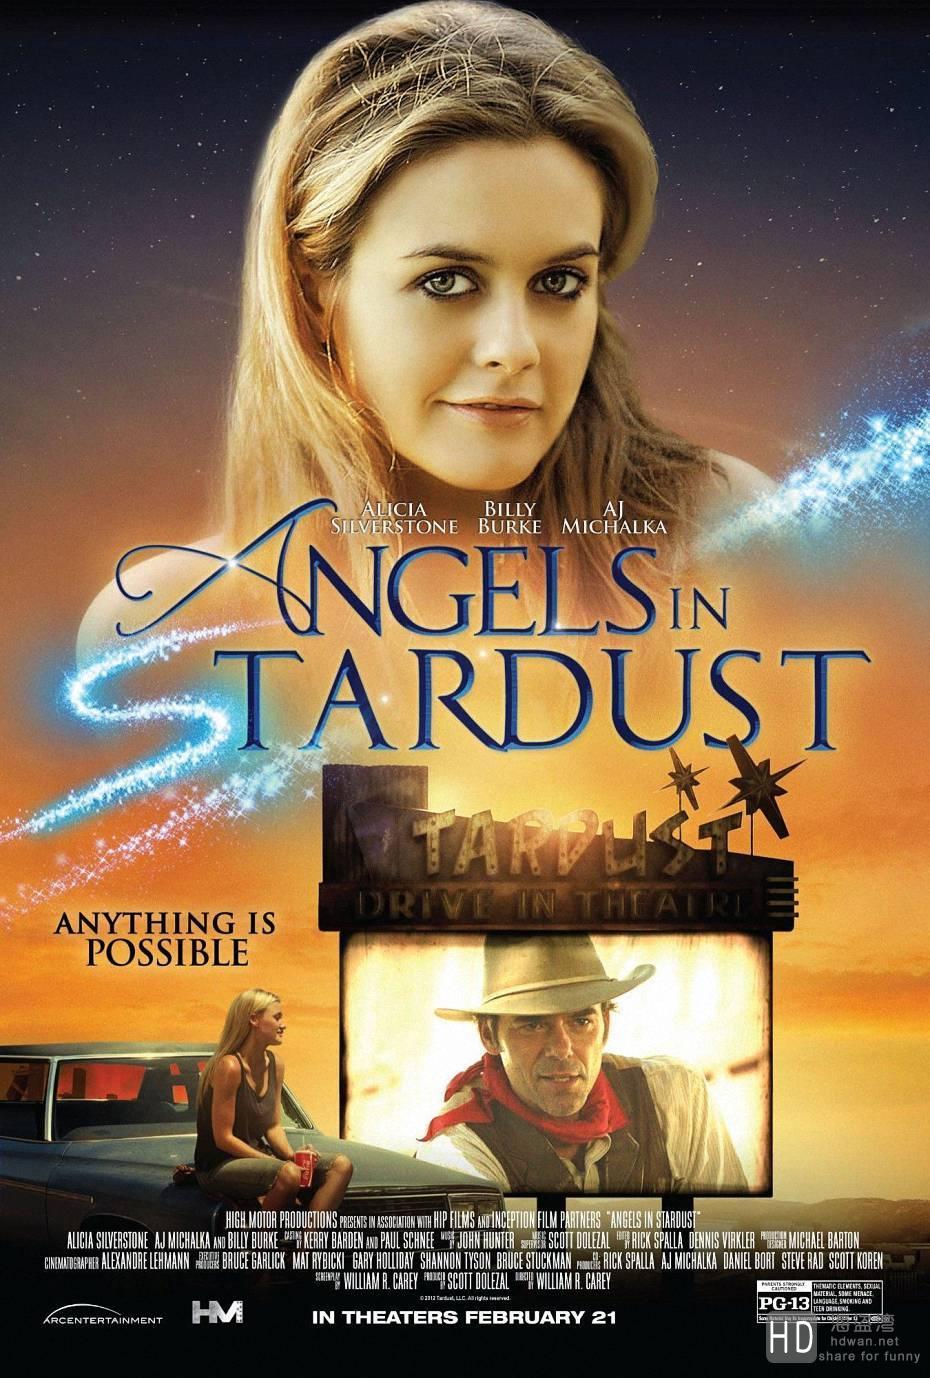 [2014][欧美][剧情][星尘天使 Angels.In.Stardust][720p-3.17GB/1080P-3.62GB]